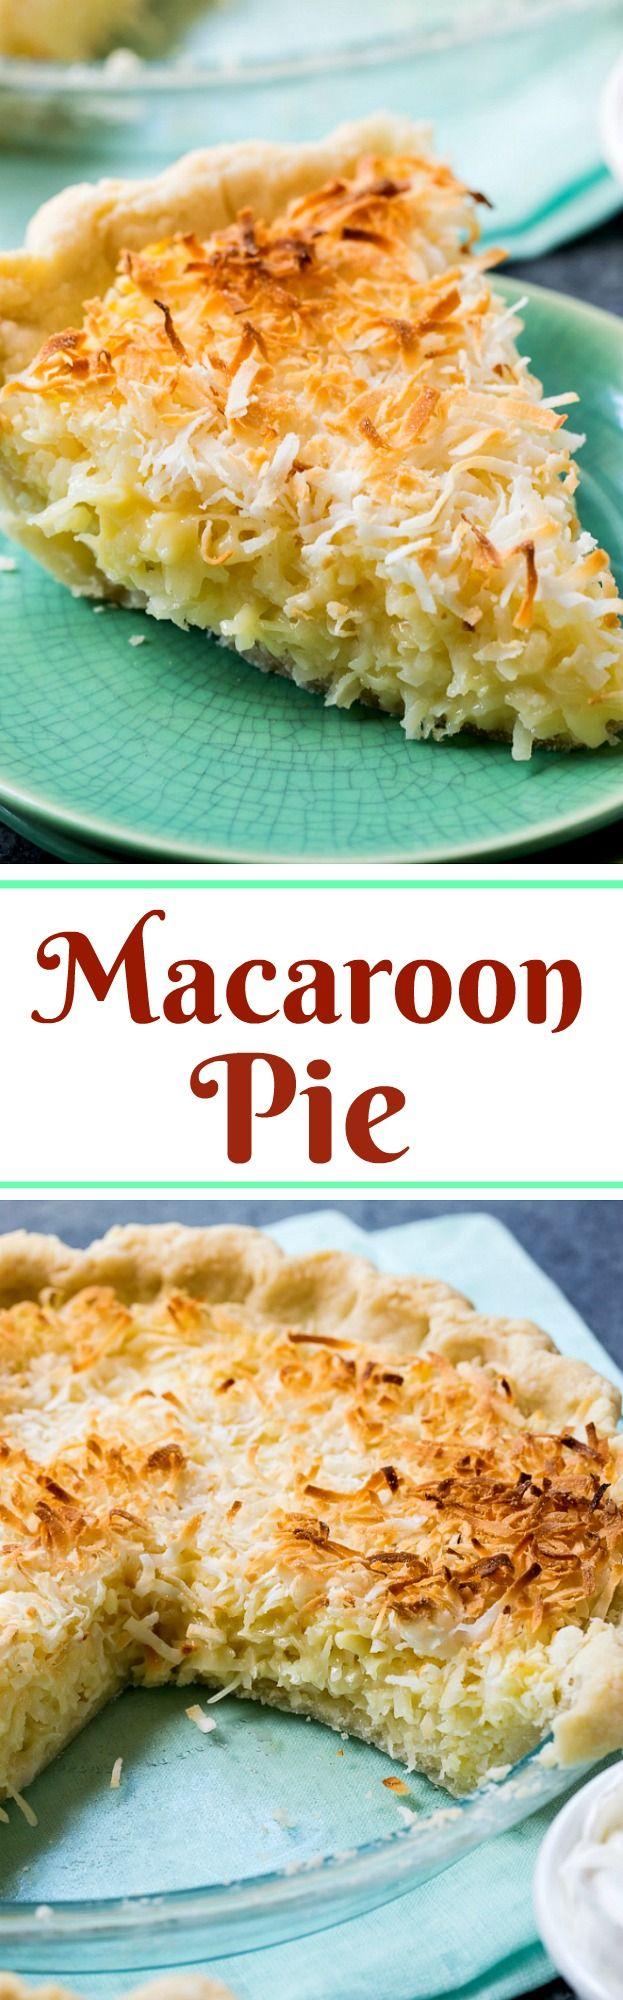 Coconut Macaroon Pie is a coconut lover's dream! Tastes like lots of macaroon cookies in a pie crust.